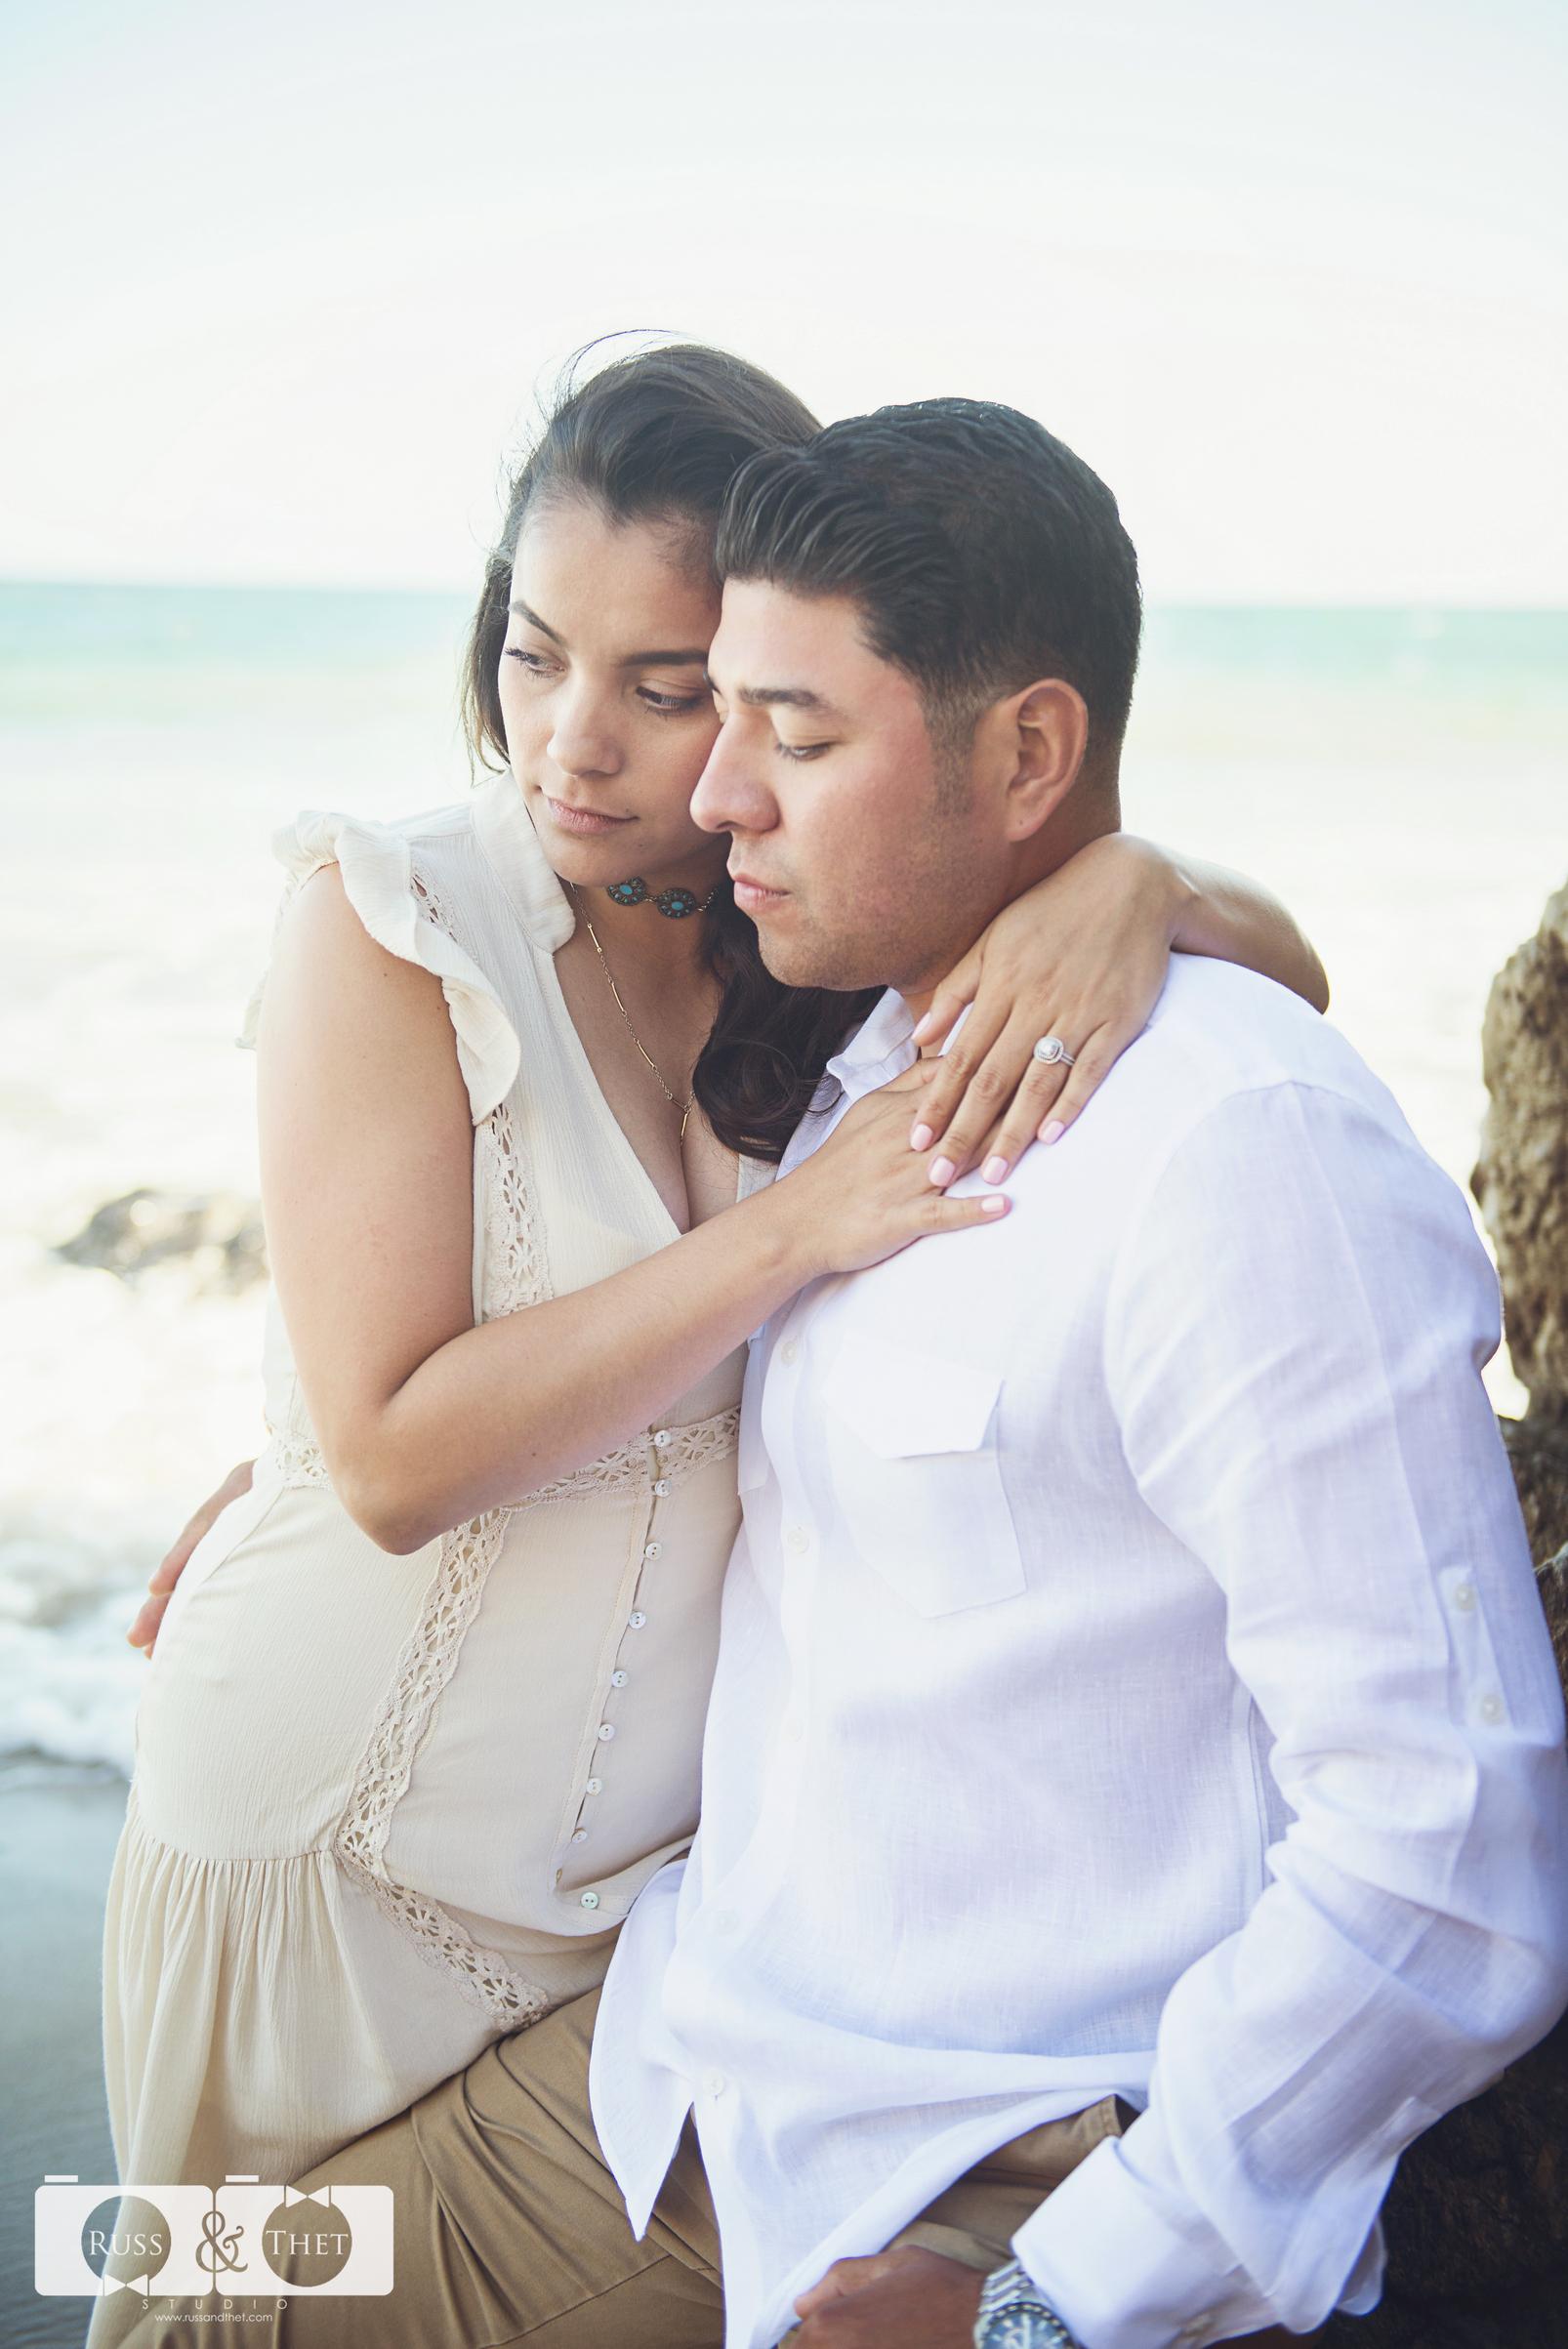 El-Matador-State-Beach-Malibu-Engagement-Photographer_ (3).jpg